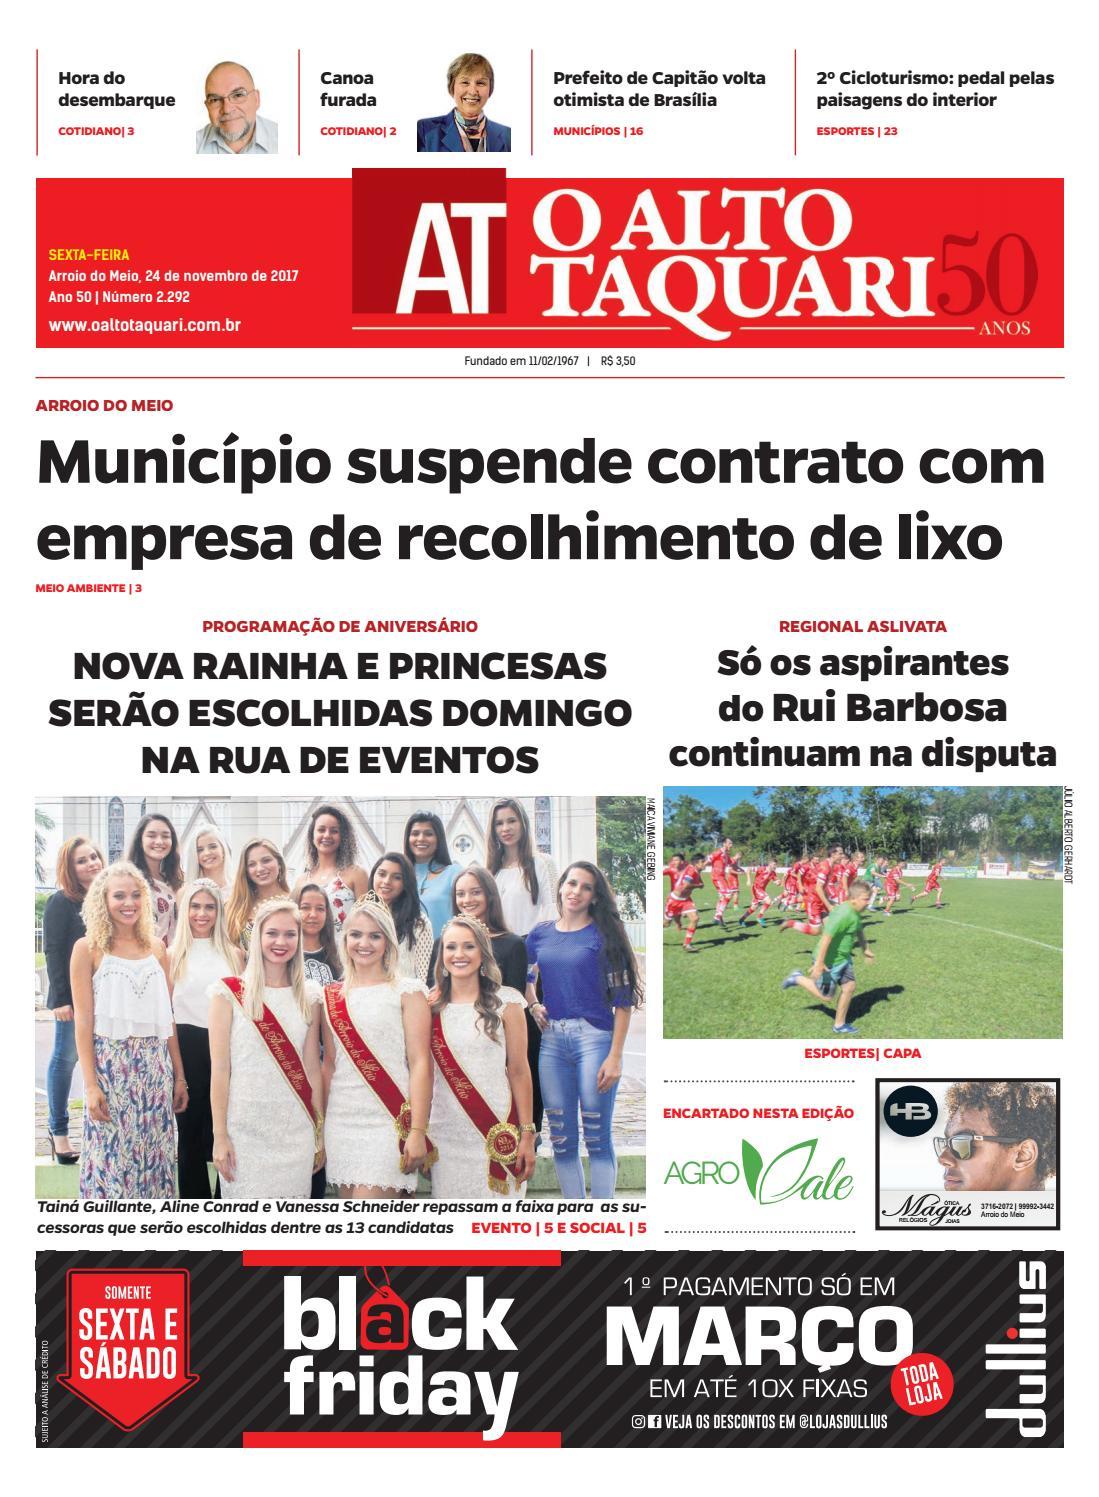 f0bff2698e Jornal O Alto Taquari - 24 de novembro de 2017 by Jornal O Alto Taquari -  issuu